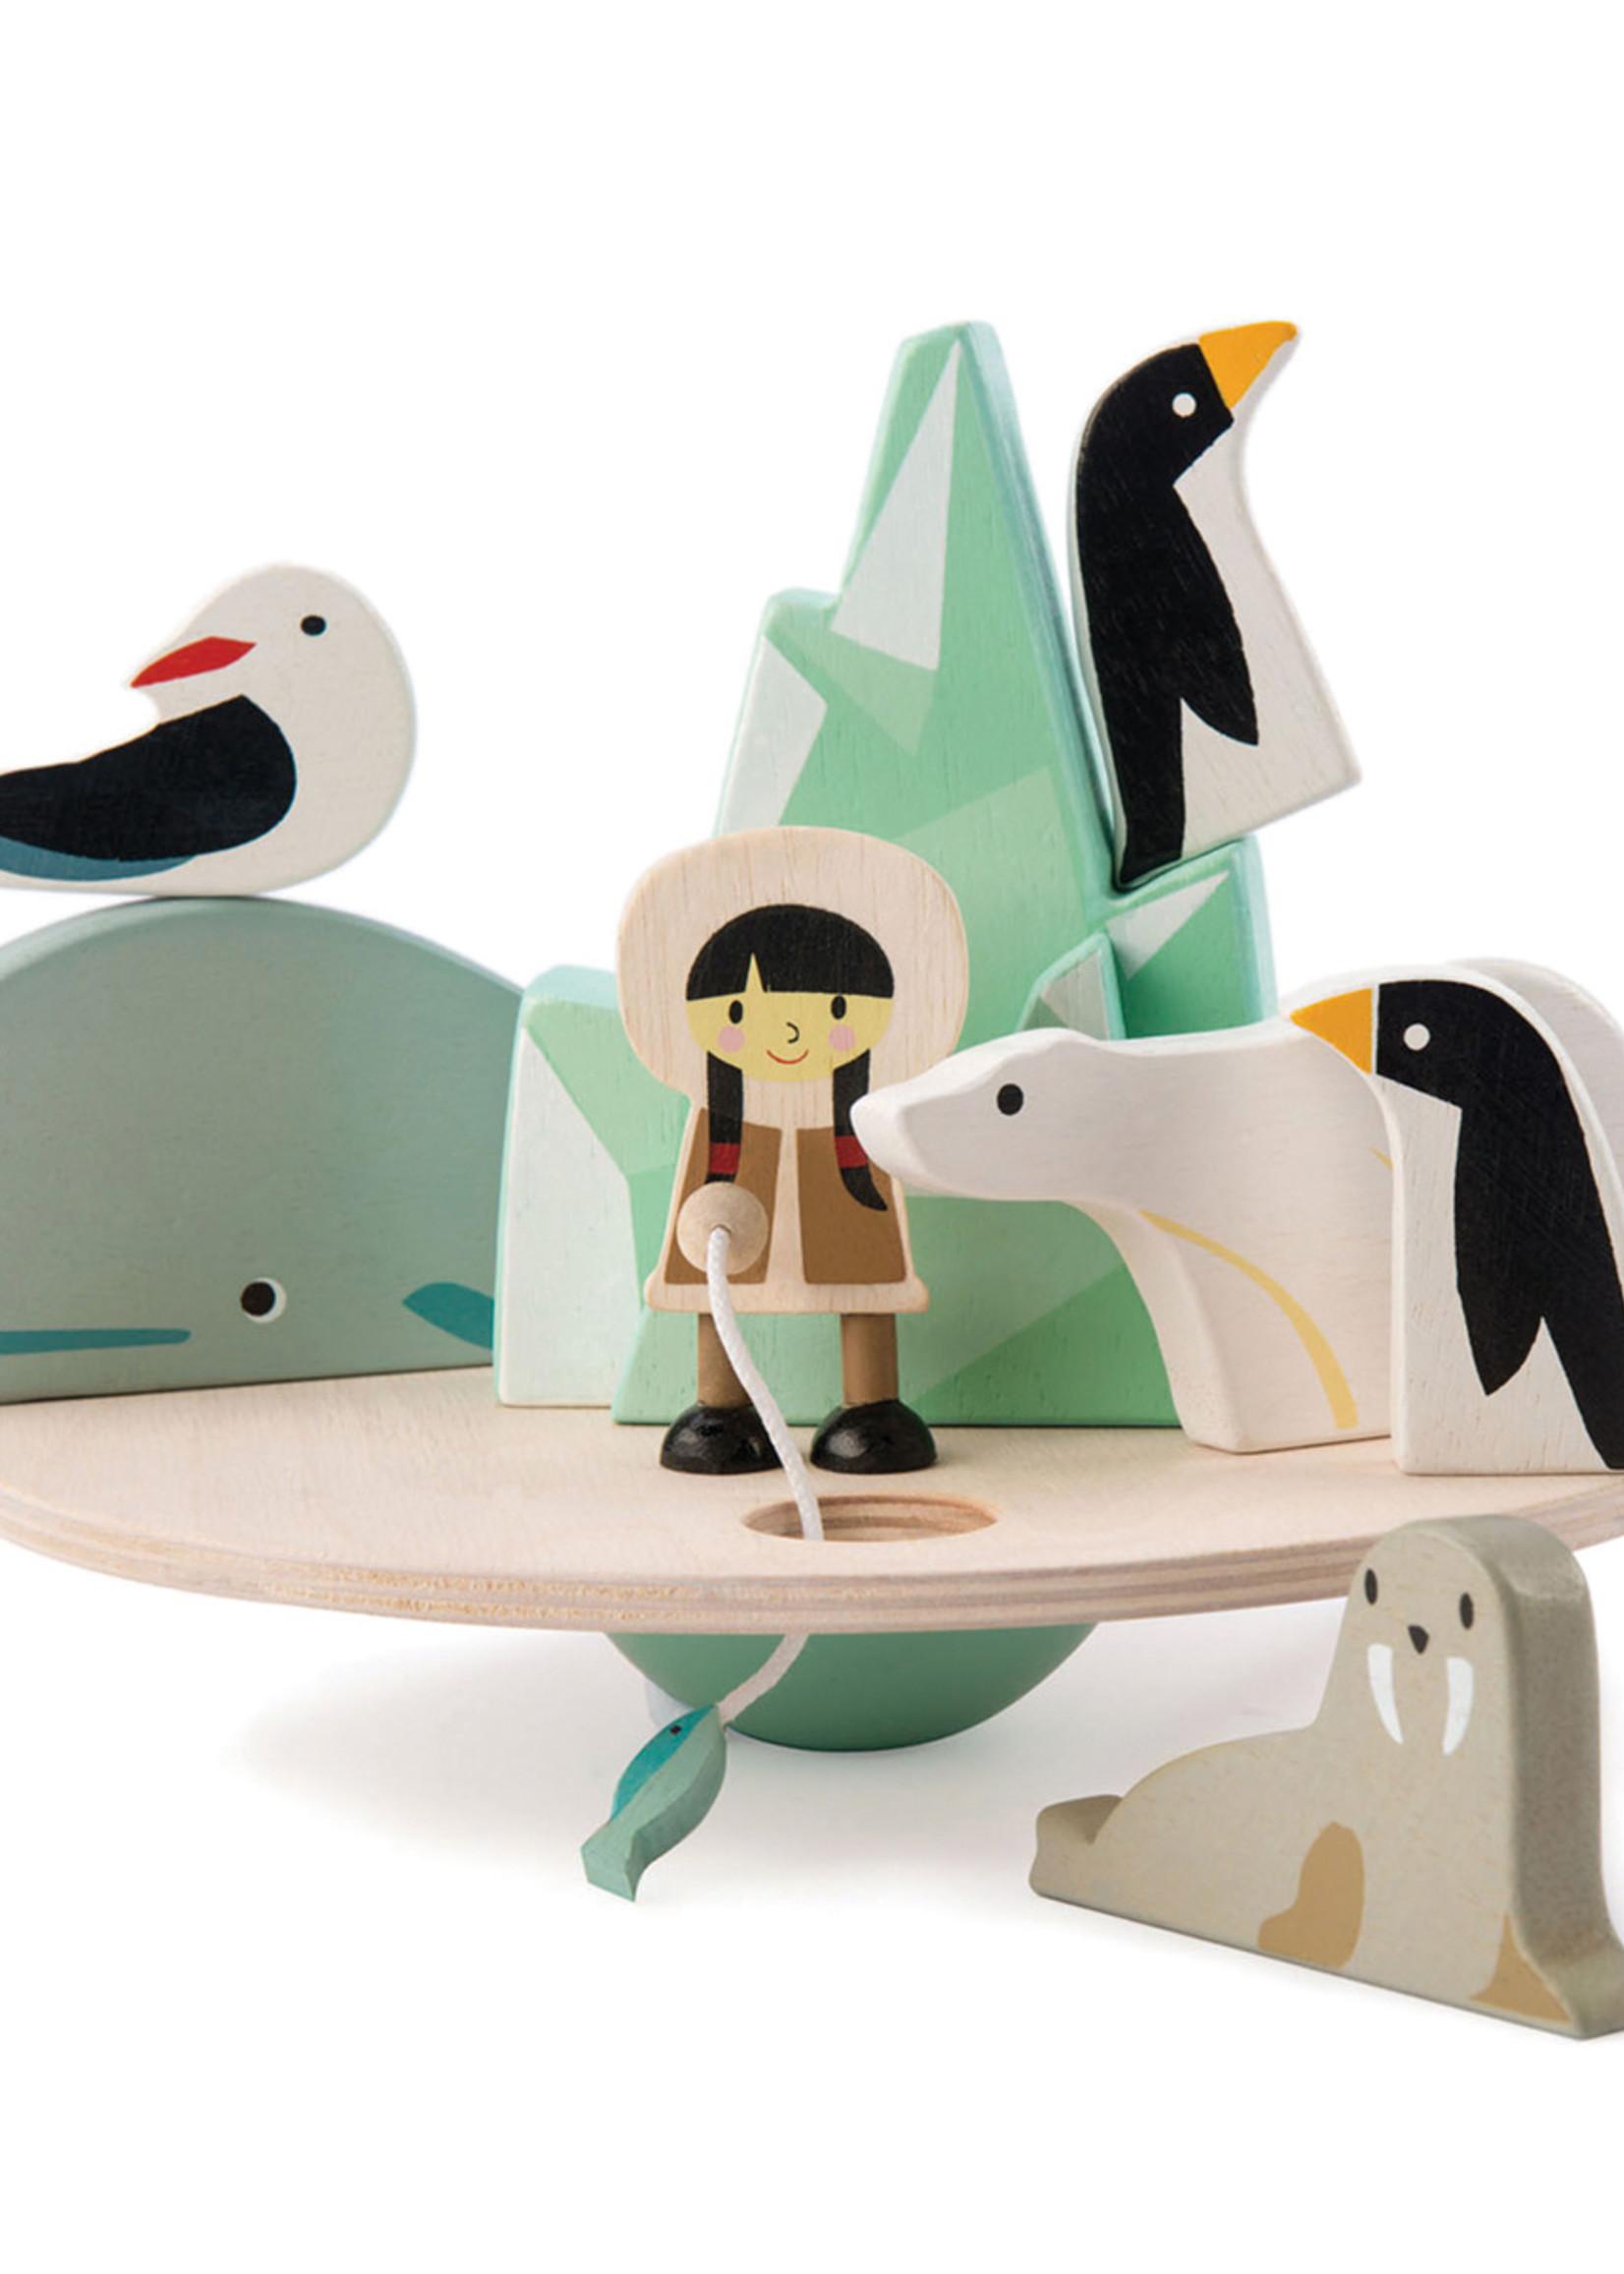 Tender Leaf Toys Balancing Arctic Circle